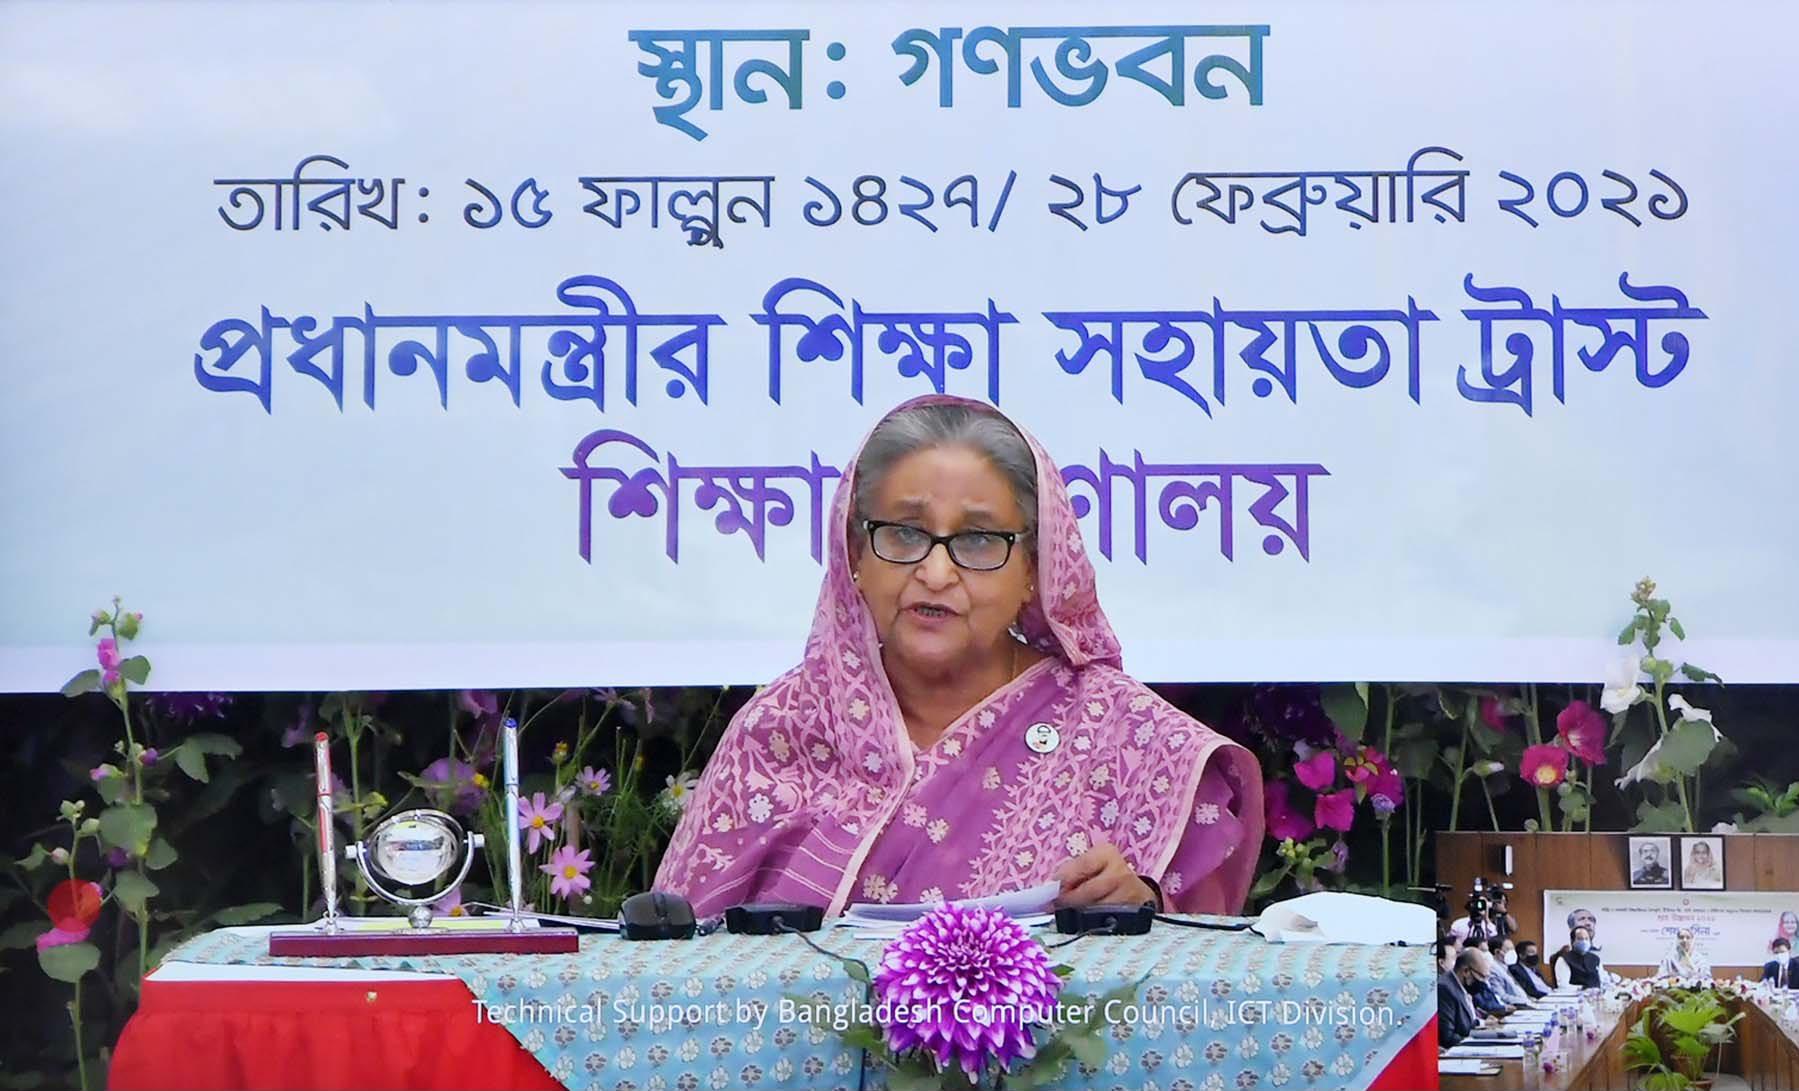 Education must evolve, says Sheikh Hasina